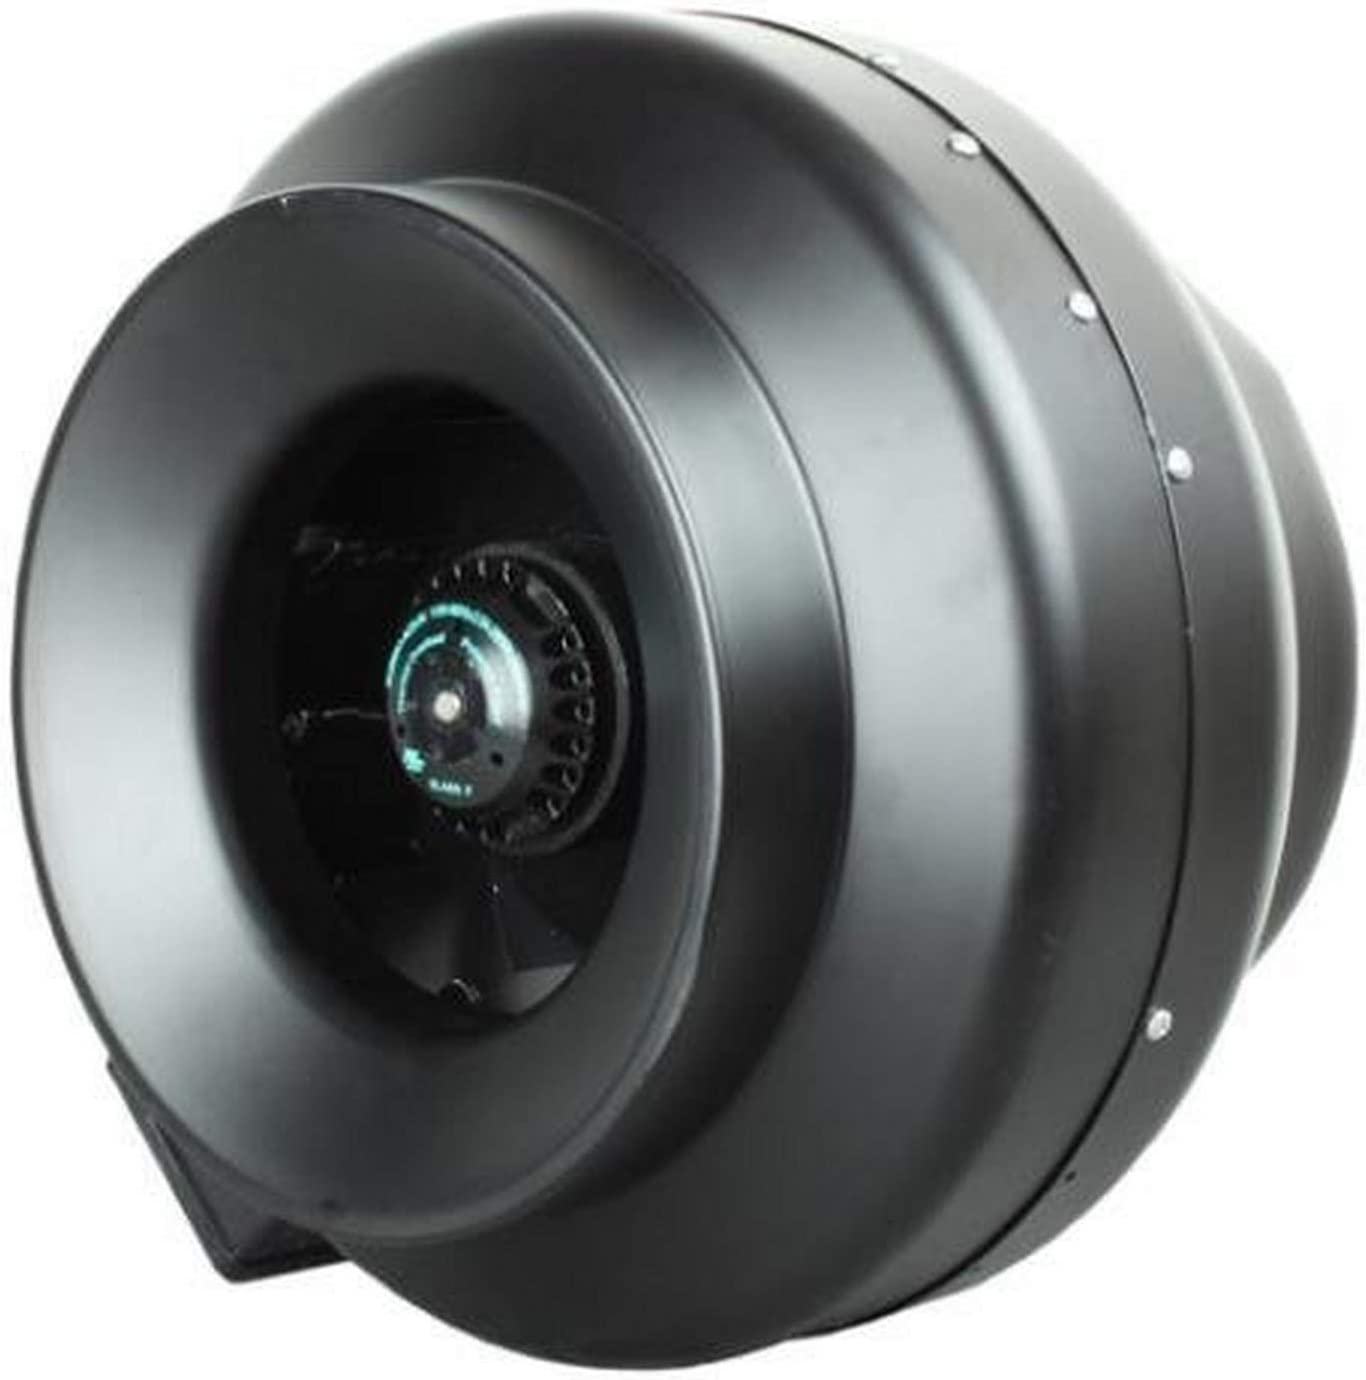 Hurricane Inline Centrifugal Fan, High Performance, Commercial-Grade for Ventilation, 1060 CFM - ETL Listed, 12-Inch, Black